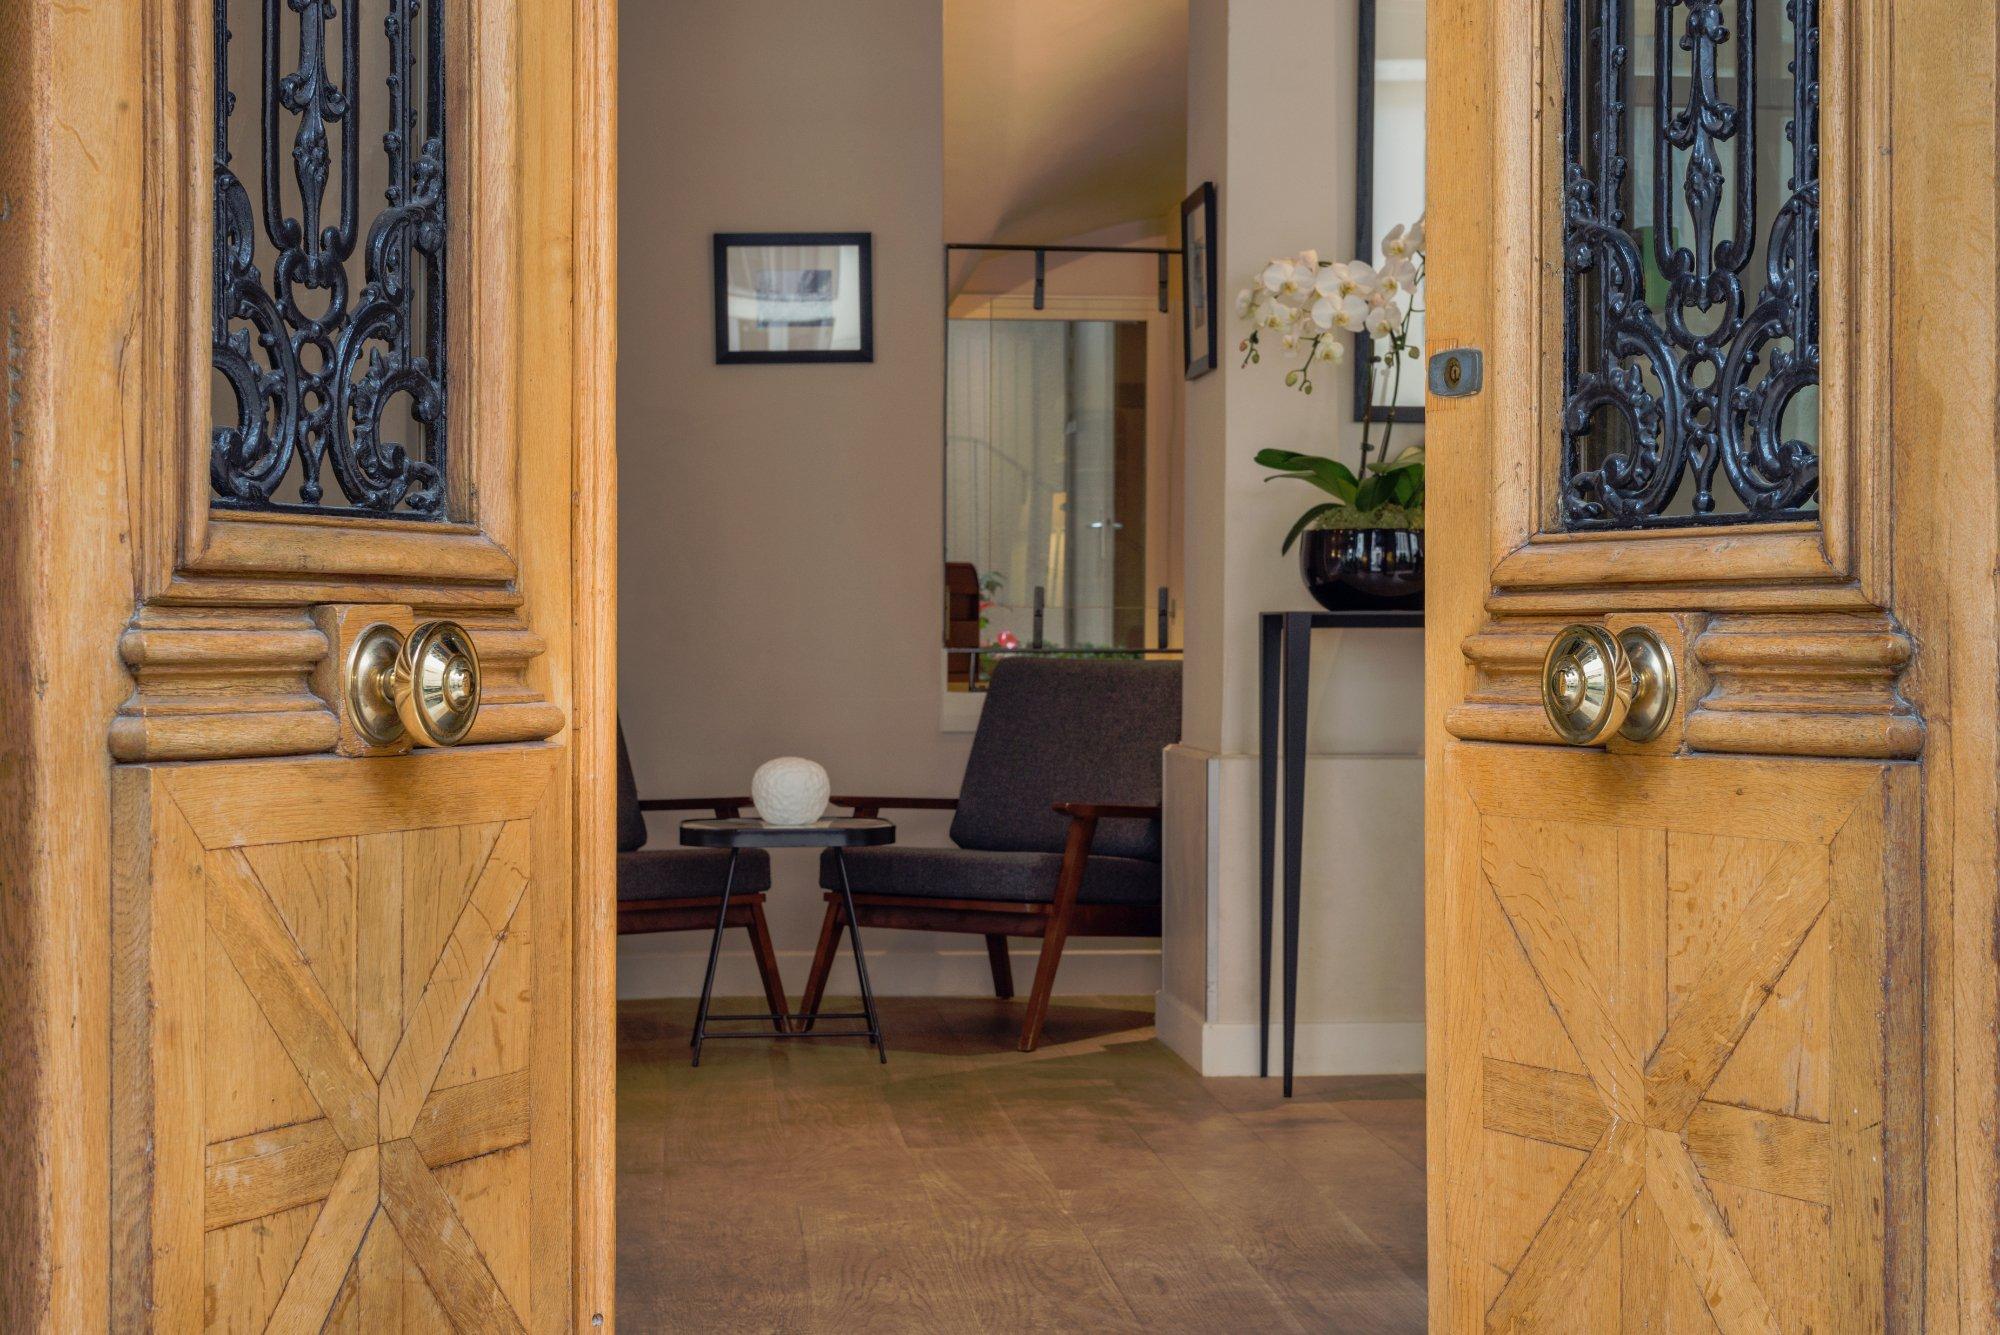 Best Western Jardin De Cluny UPDATED 2017 Prices & Hotel Reviews